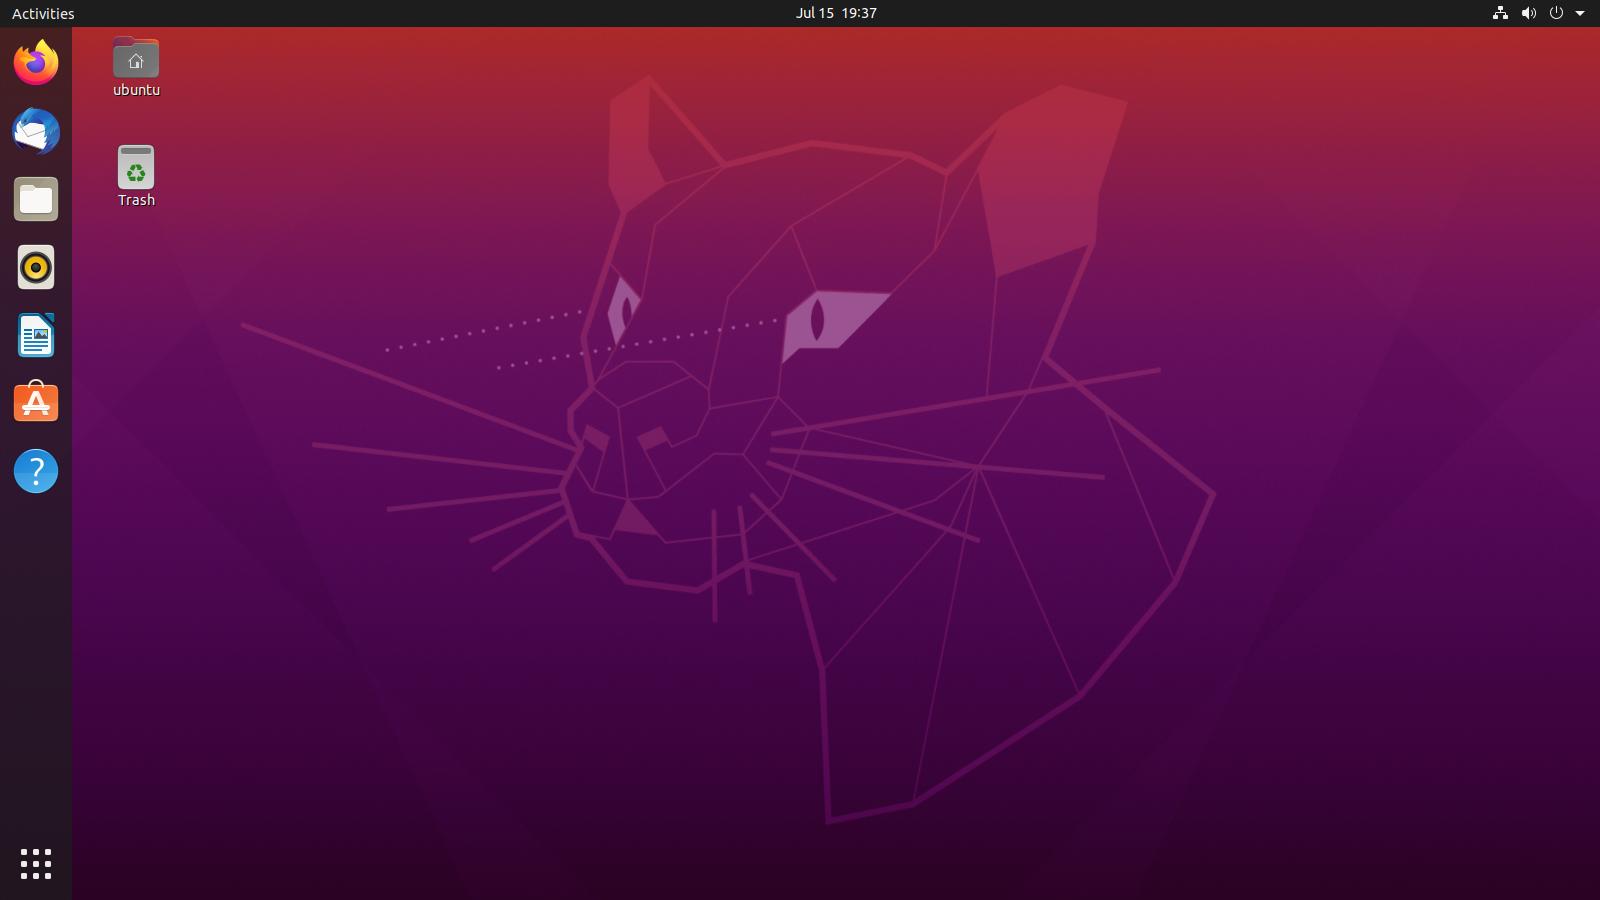 Ubuntu 20.04 Focal Fossa.